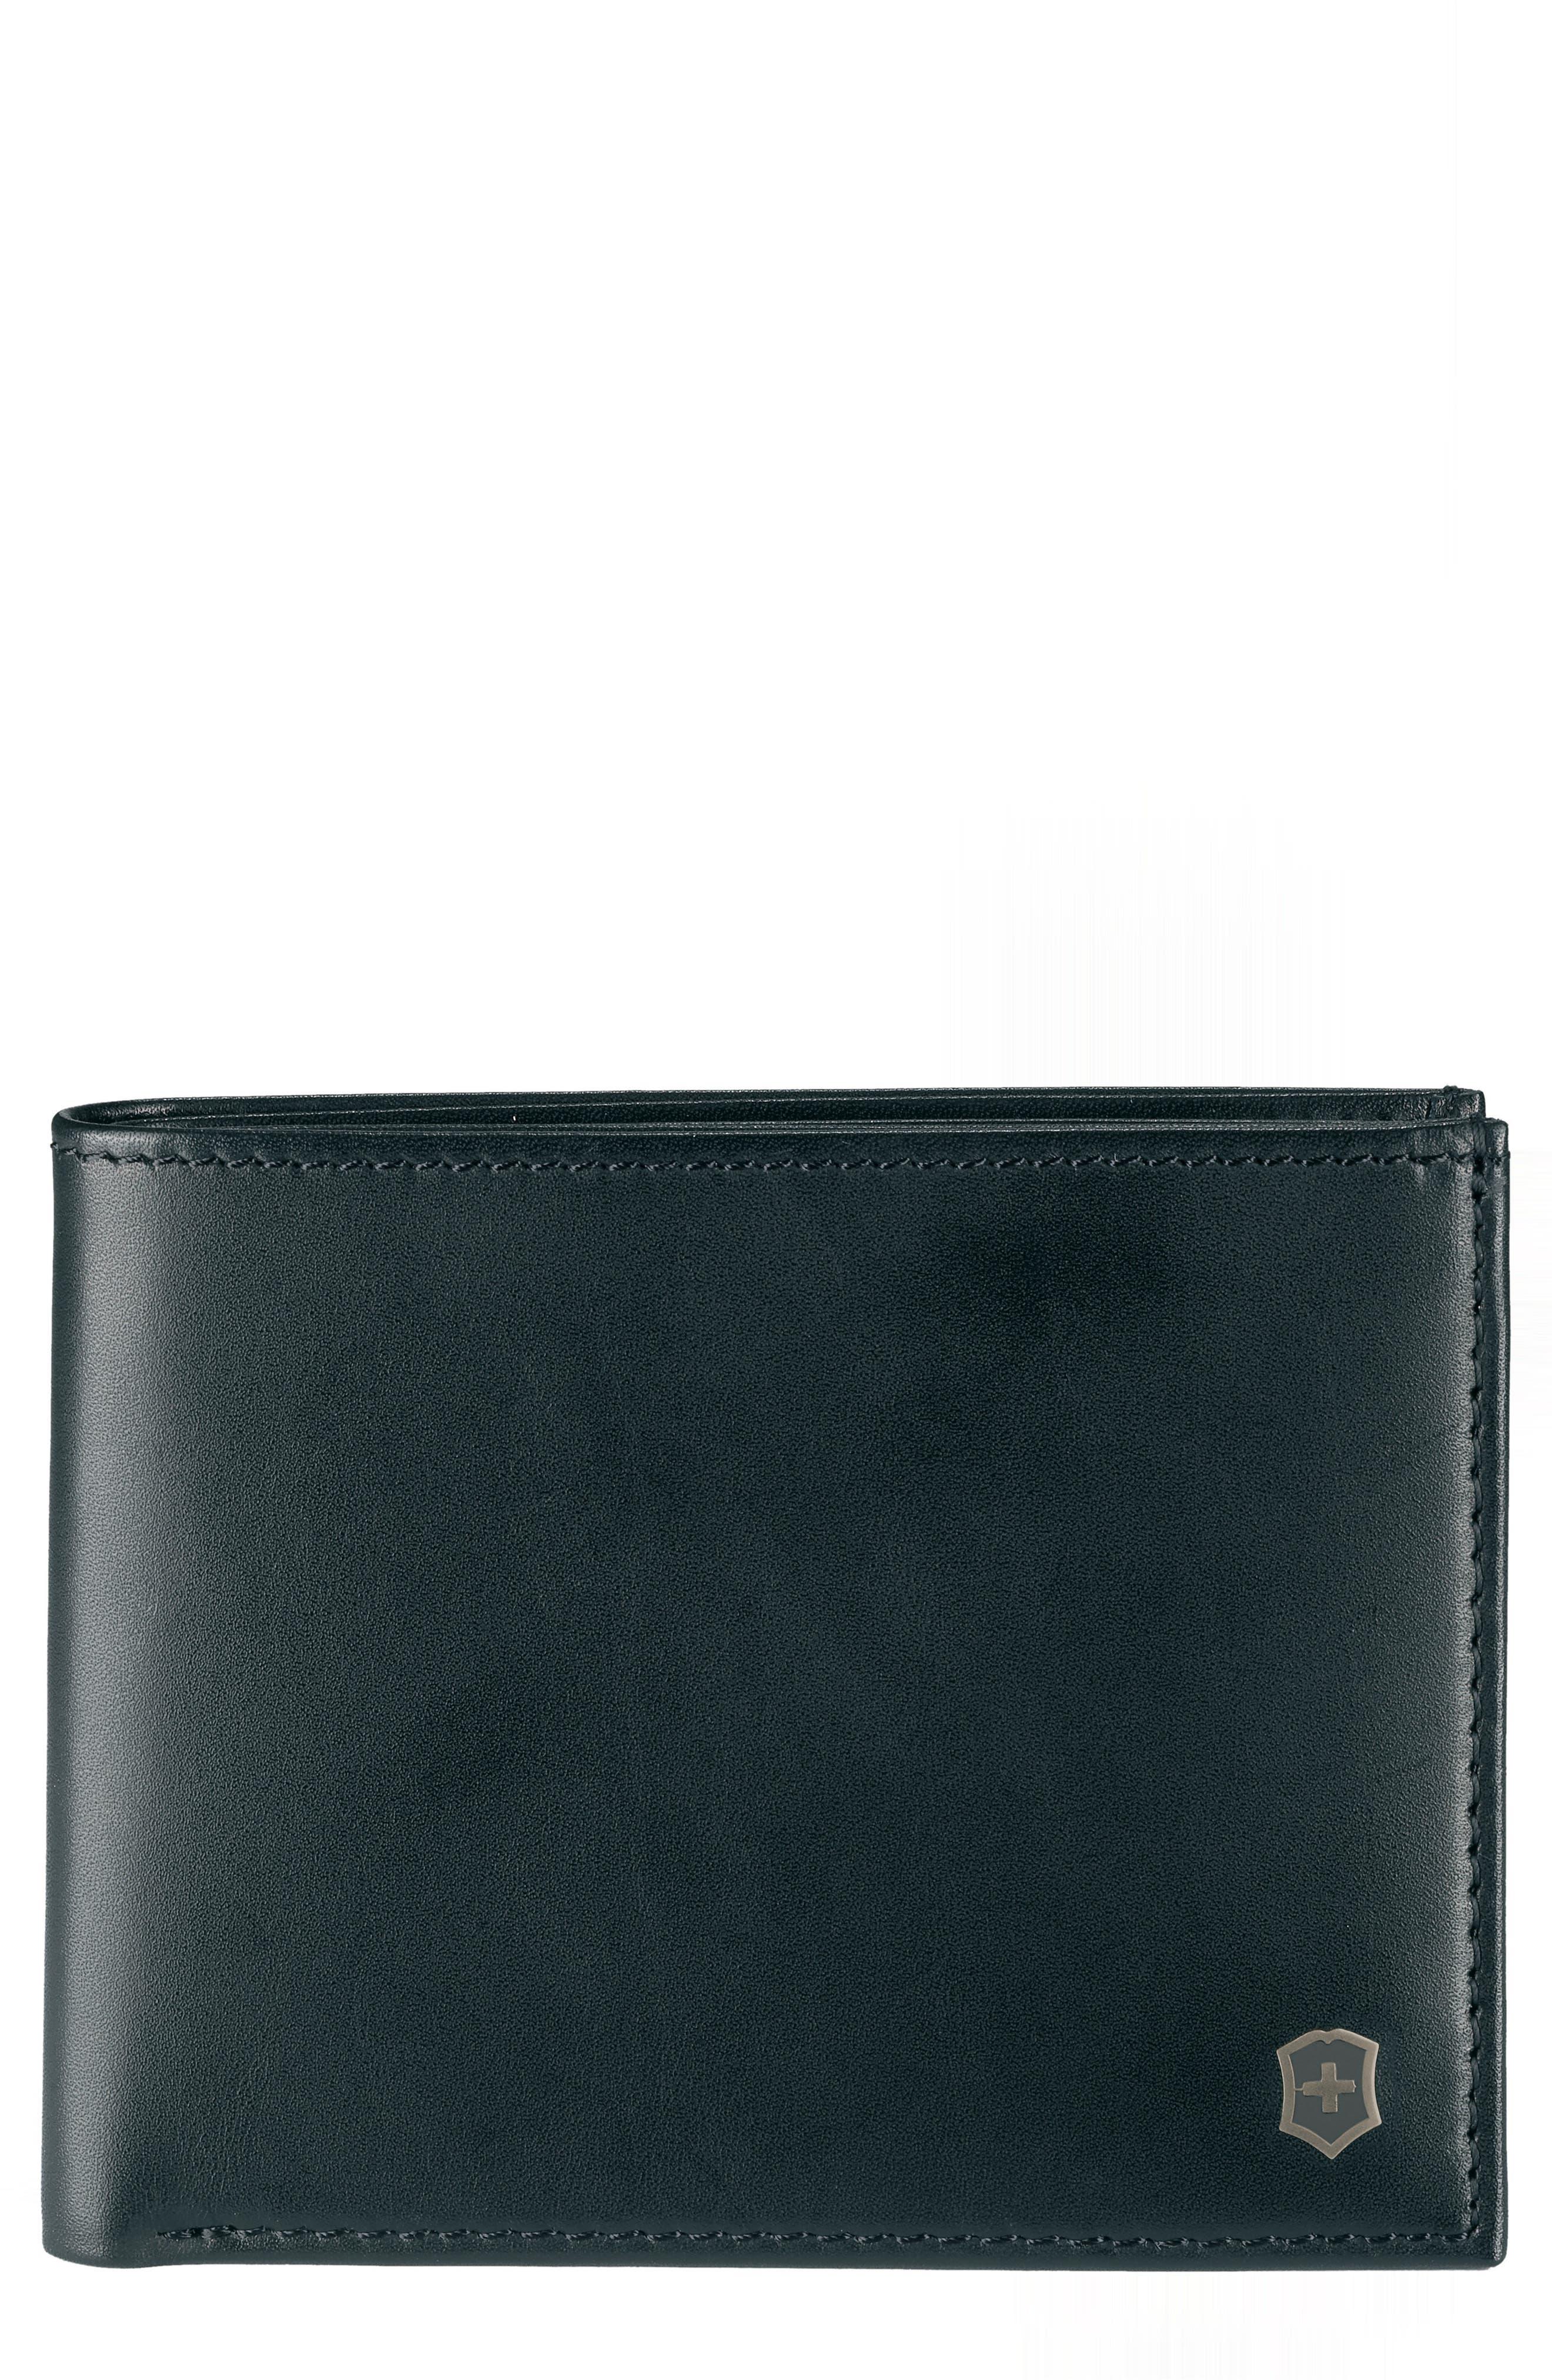 Altius Edge Appolonios RFID Leather Wallet,                             Main thumbnail 1, color,                             BLACK